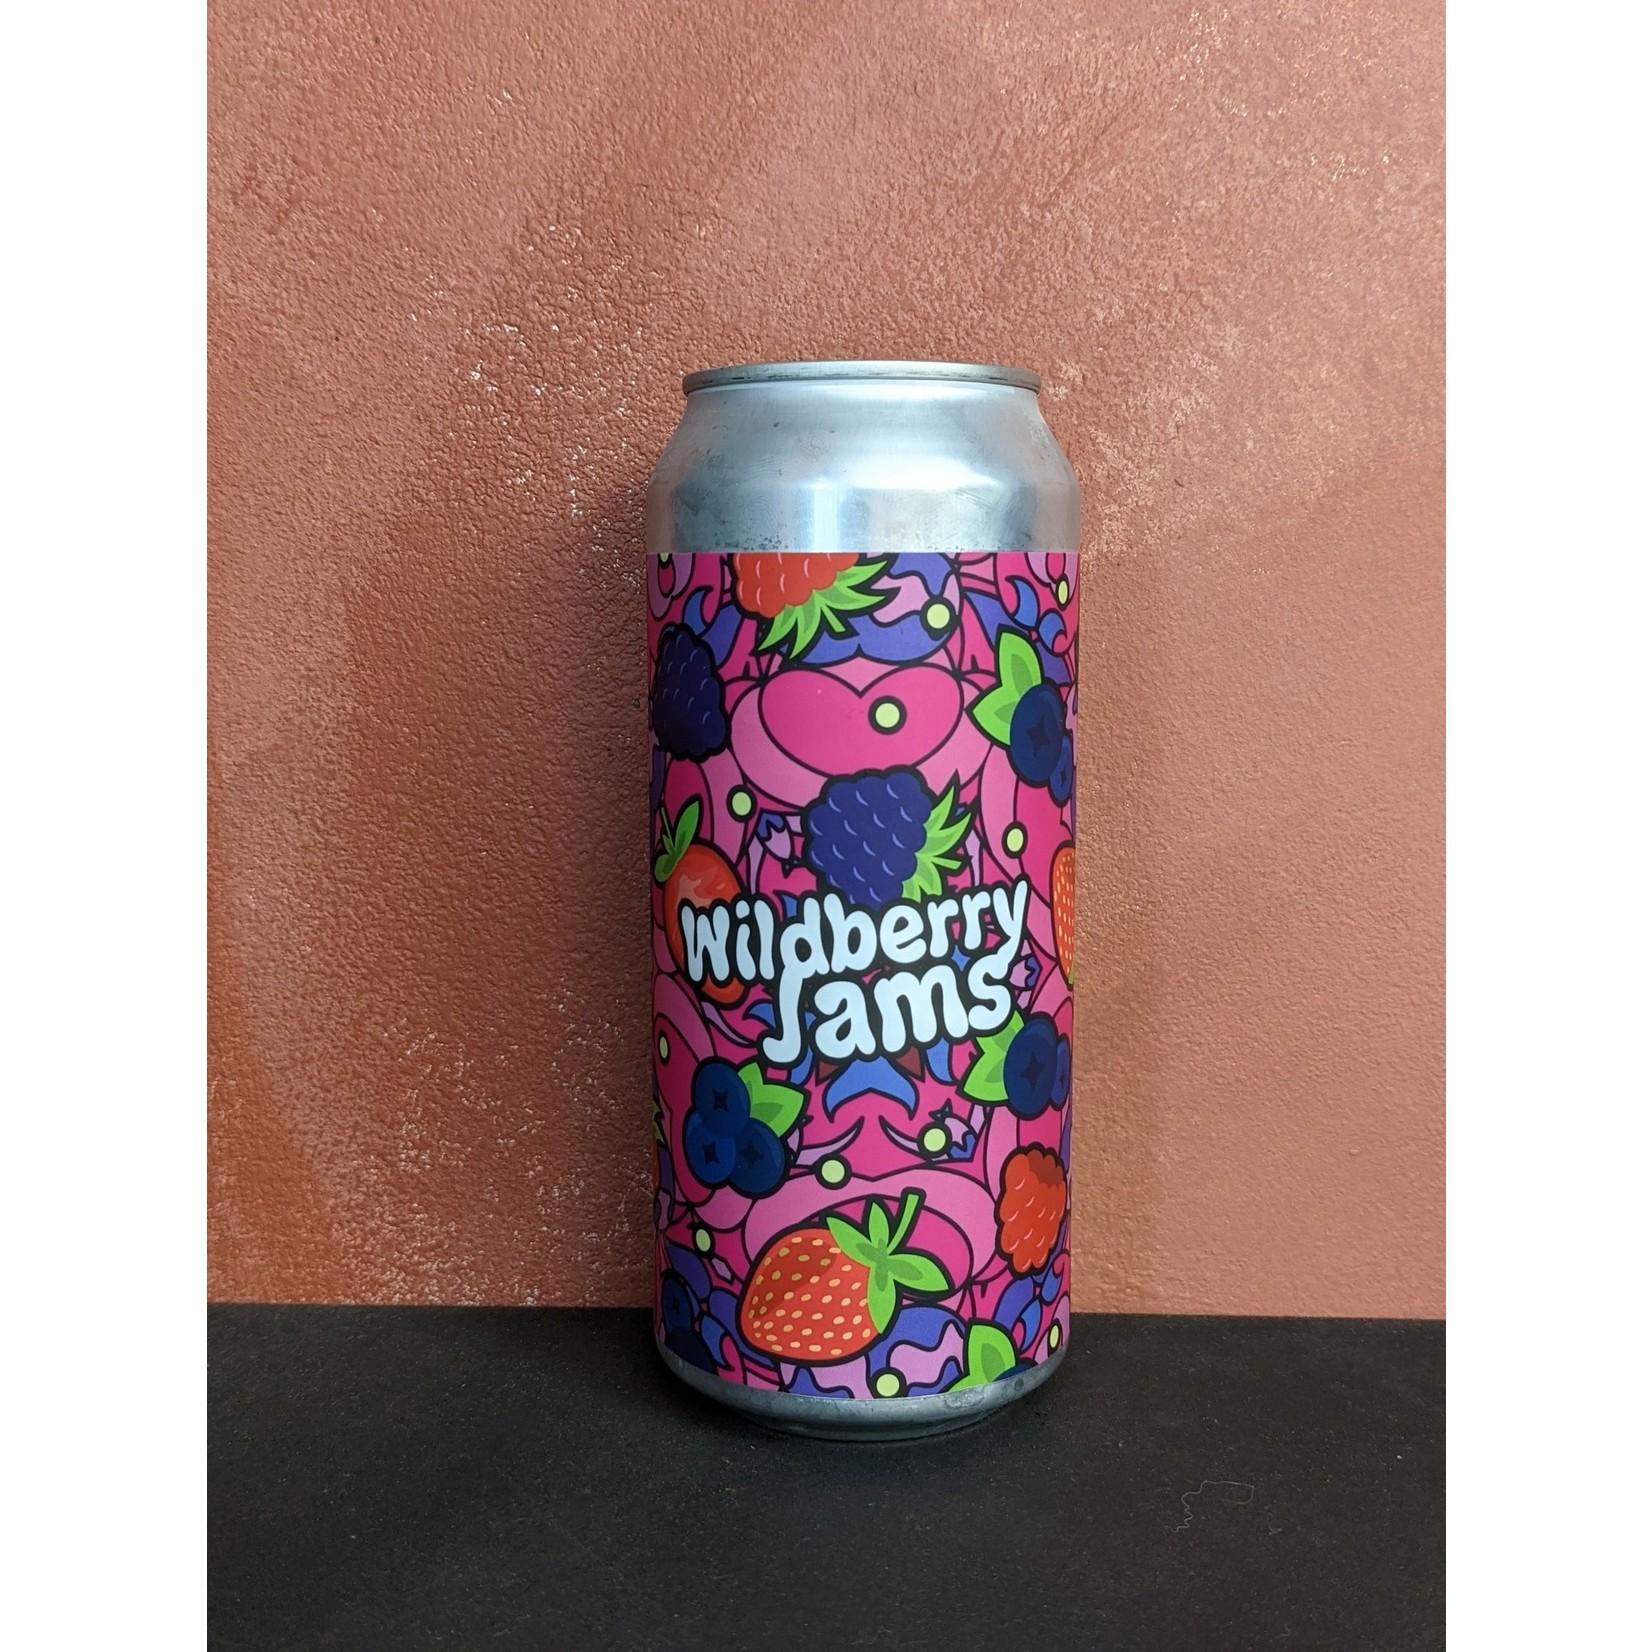 "Brix City ""Wildberry Jams"" Fruited Milkshake IPA CAN"